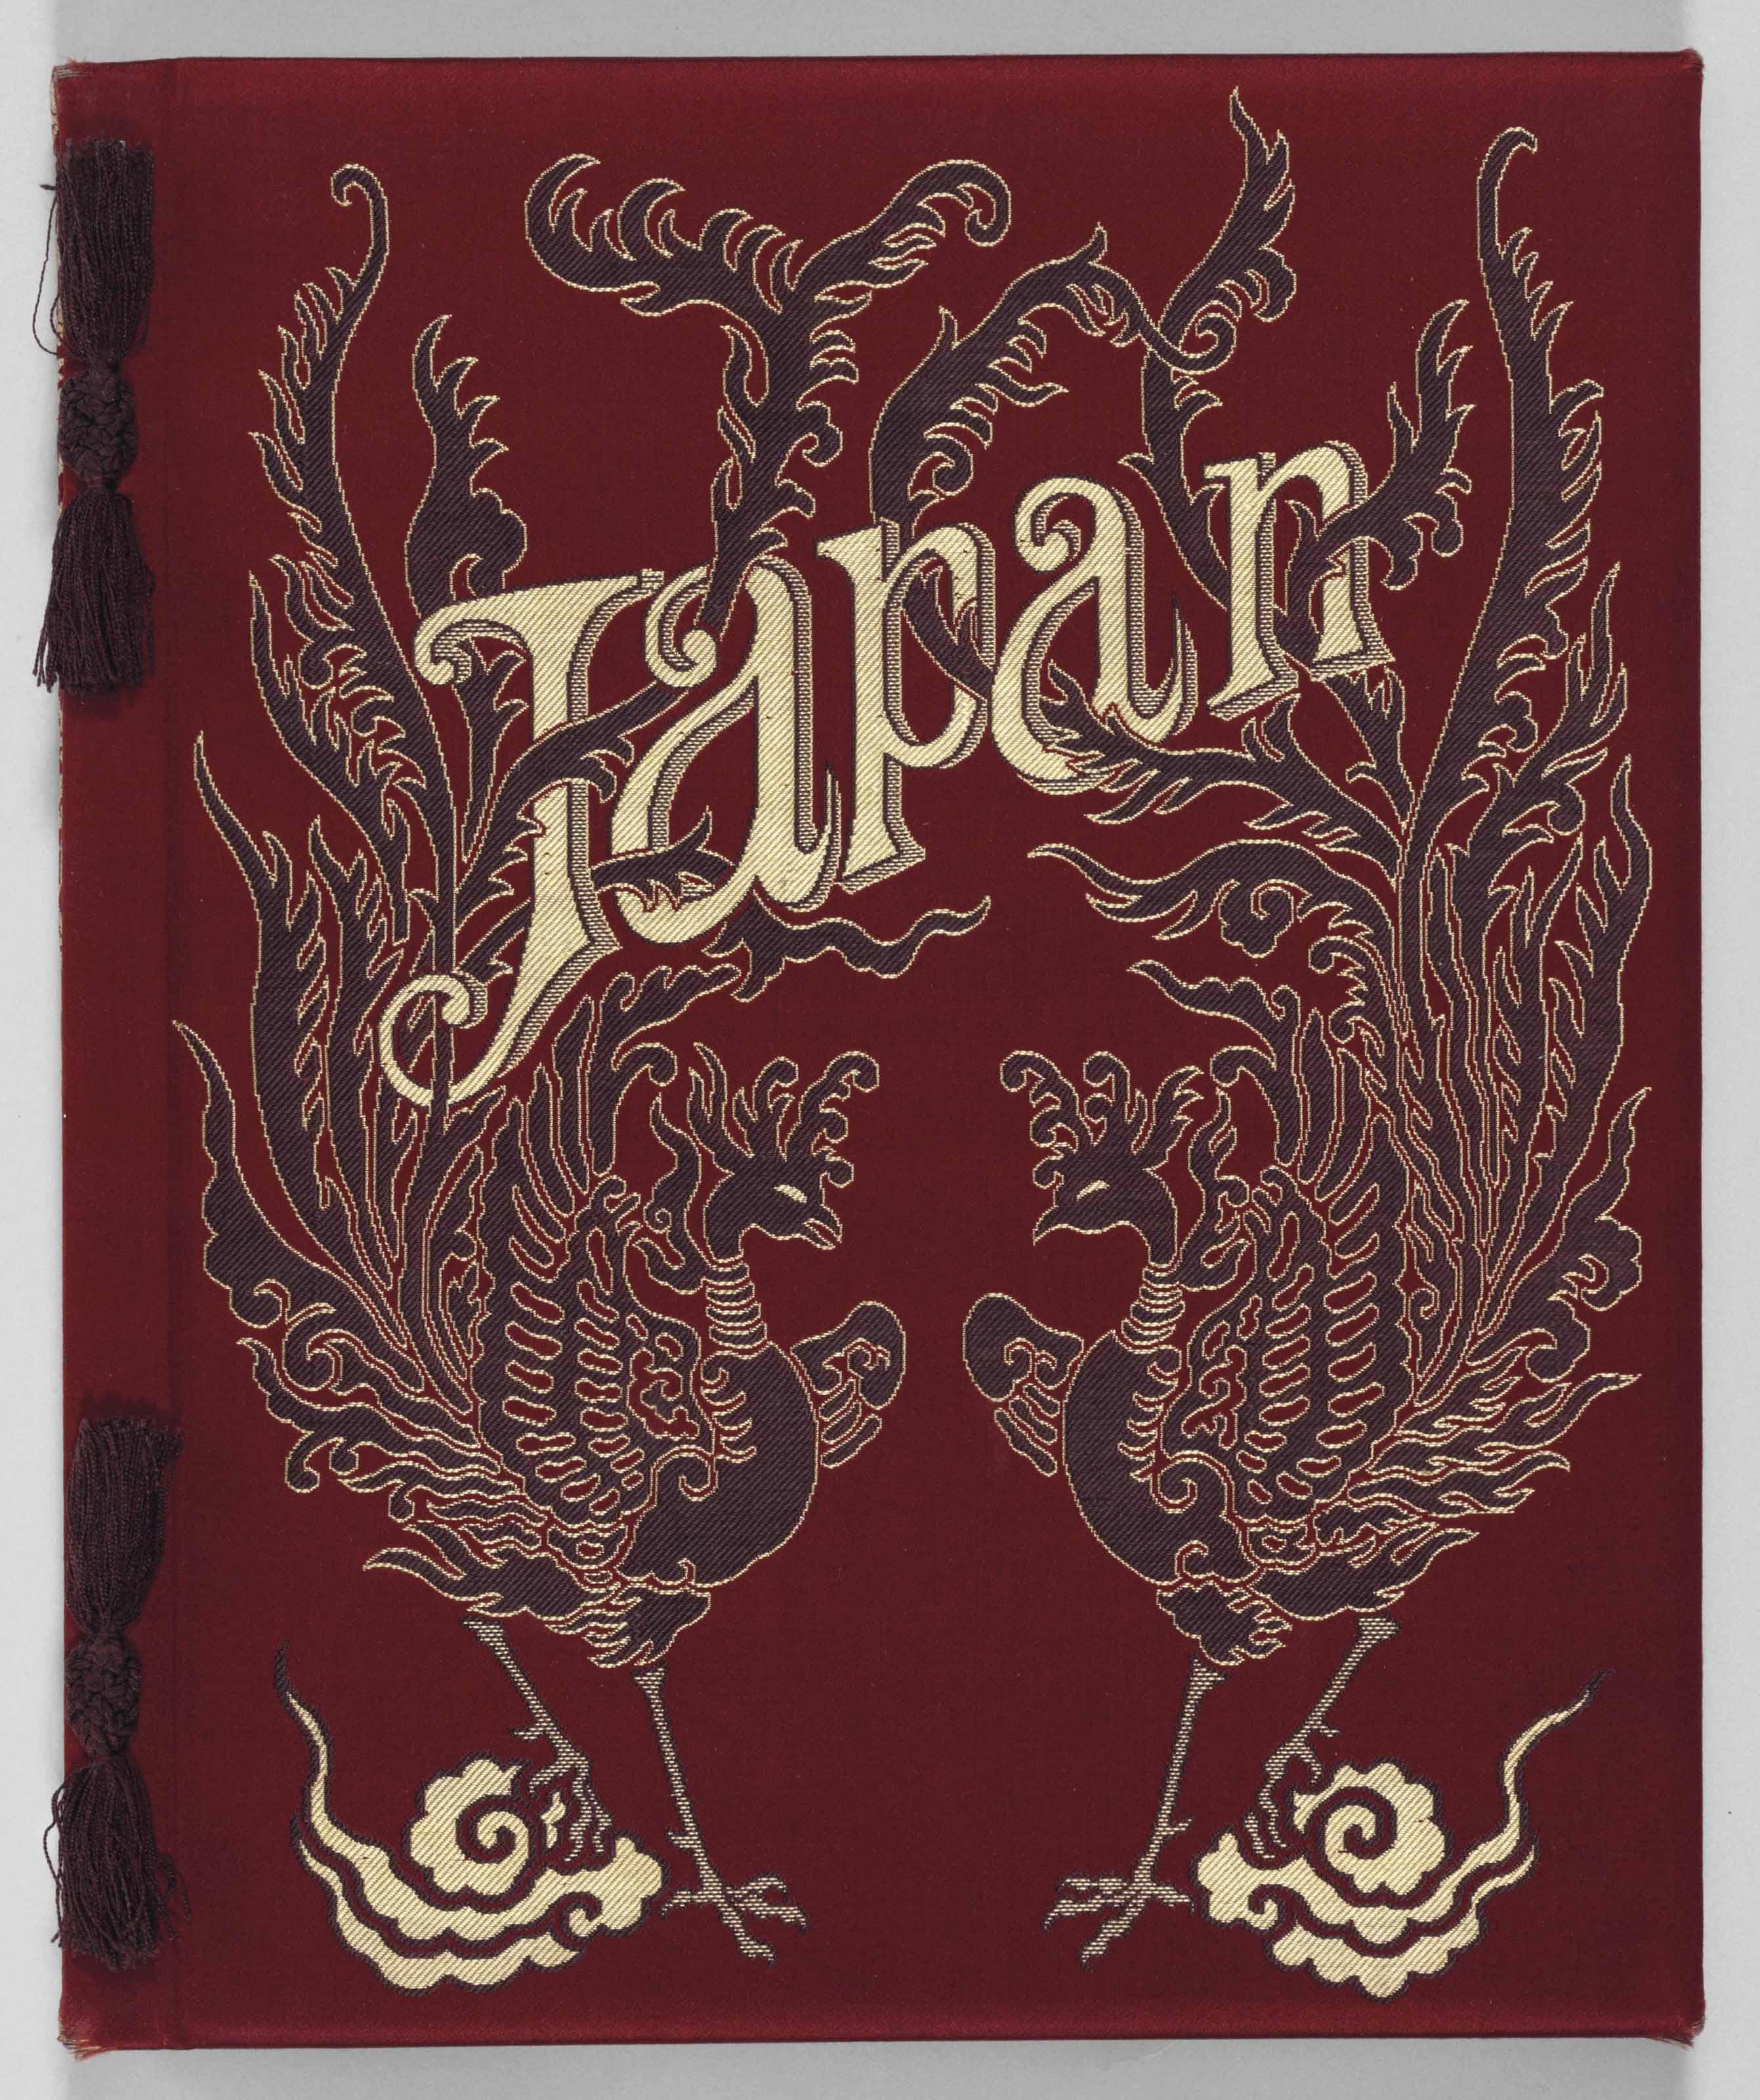 BRINKLEY, Frank, Capt. Japan: